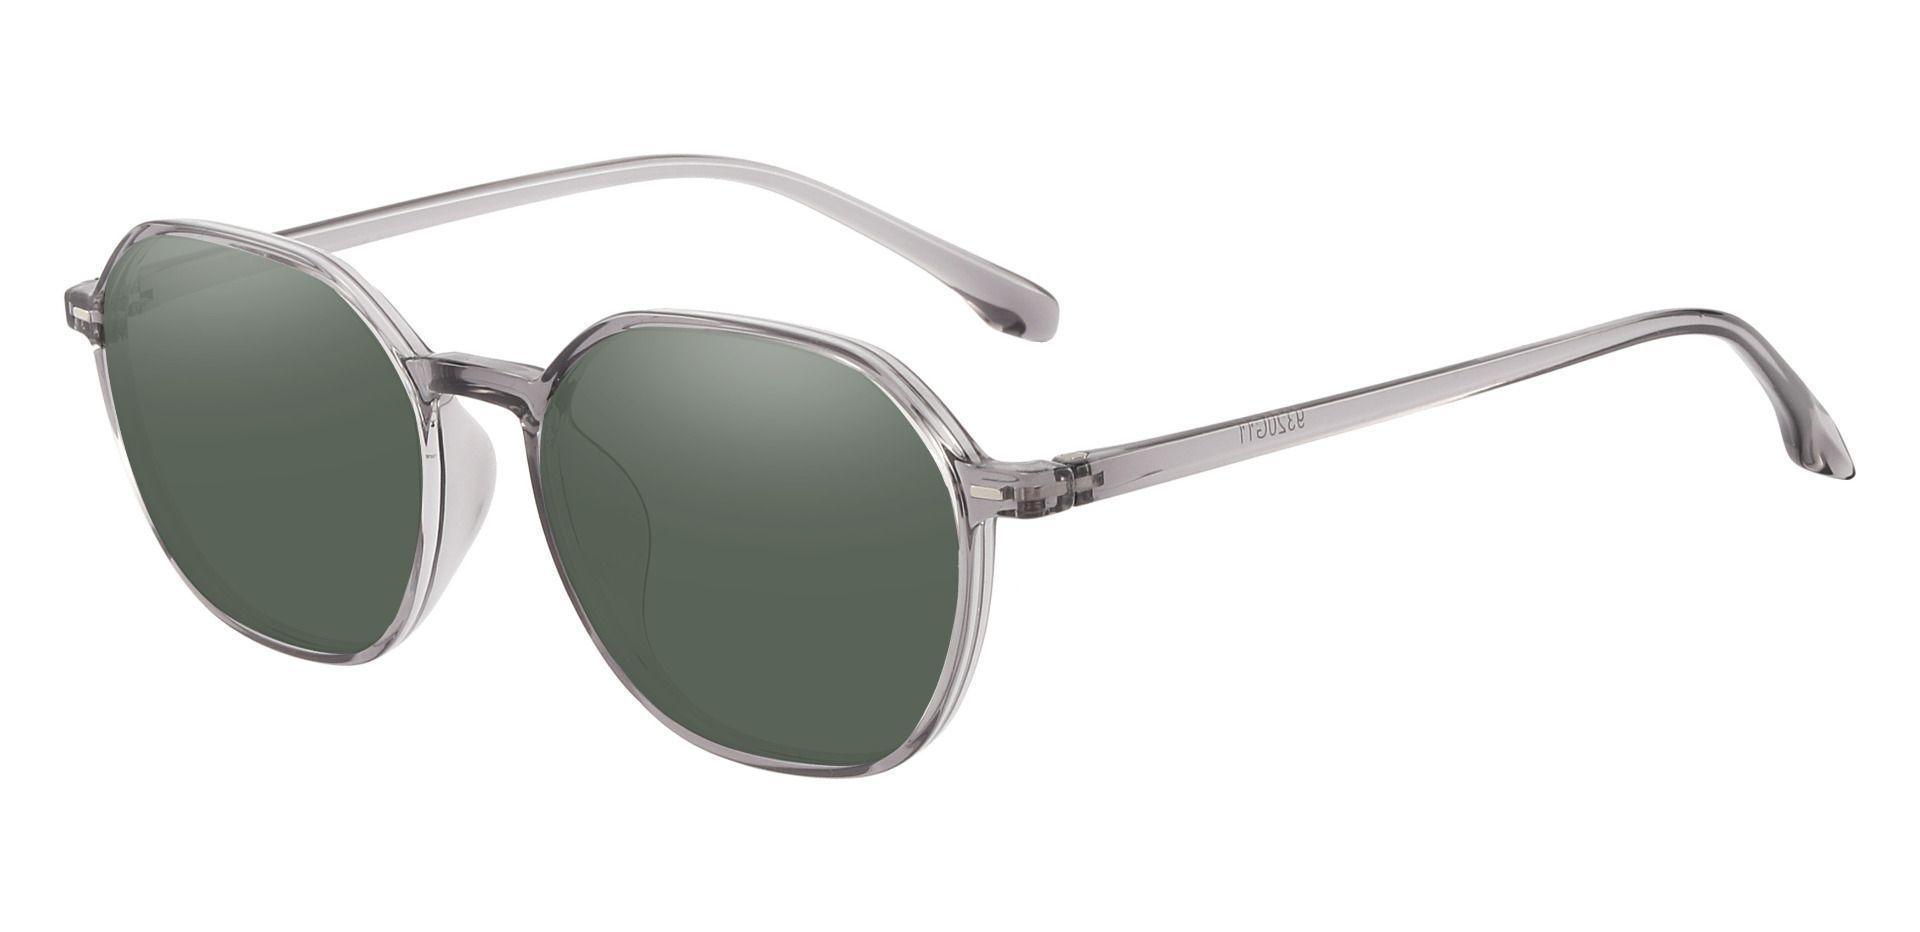 Detroit Geometric Prescription Sunglasses - Gray Frame With Green Lenses